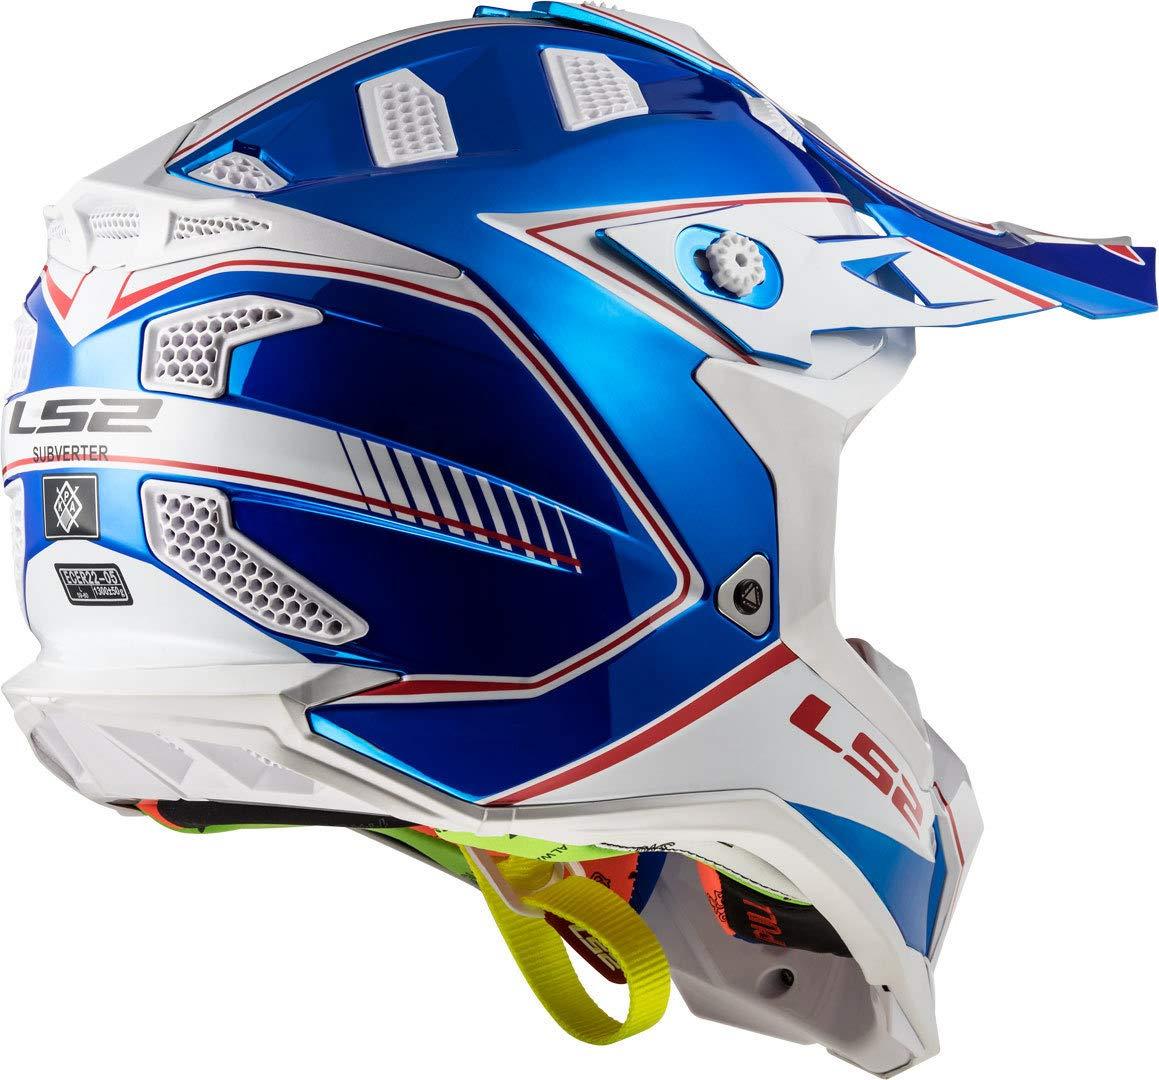 LS2 Caschi Moto MX470 Subverter Power Chrome Blu